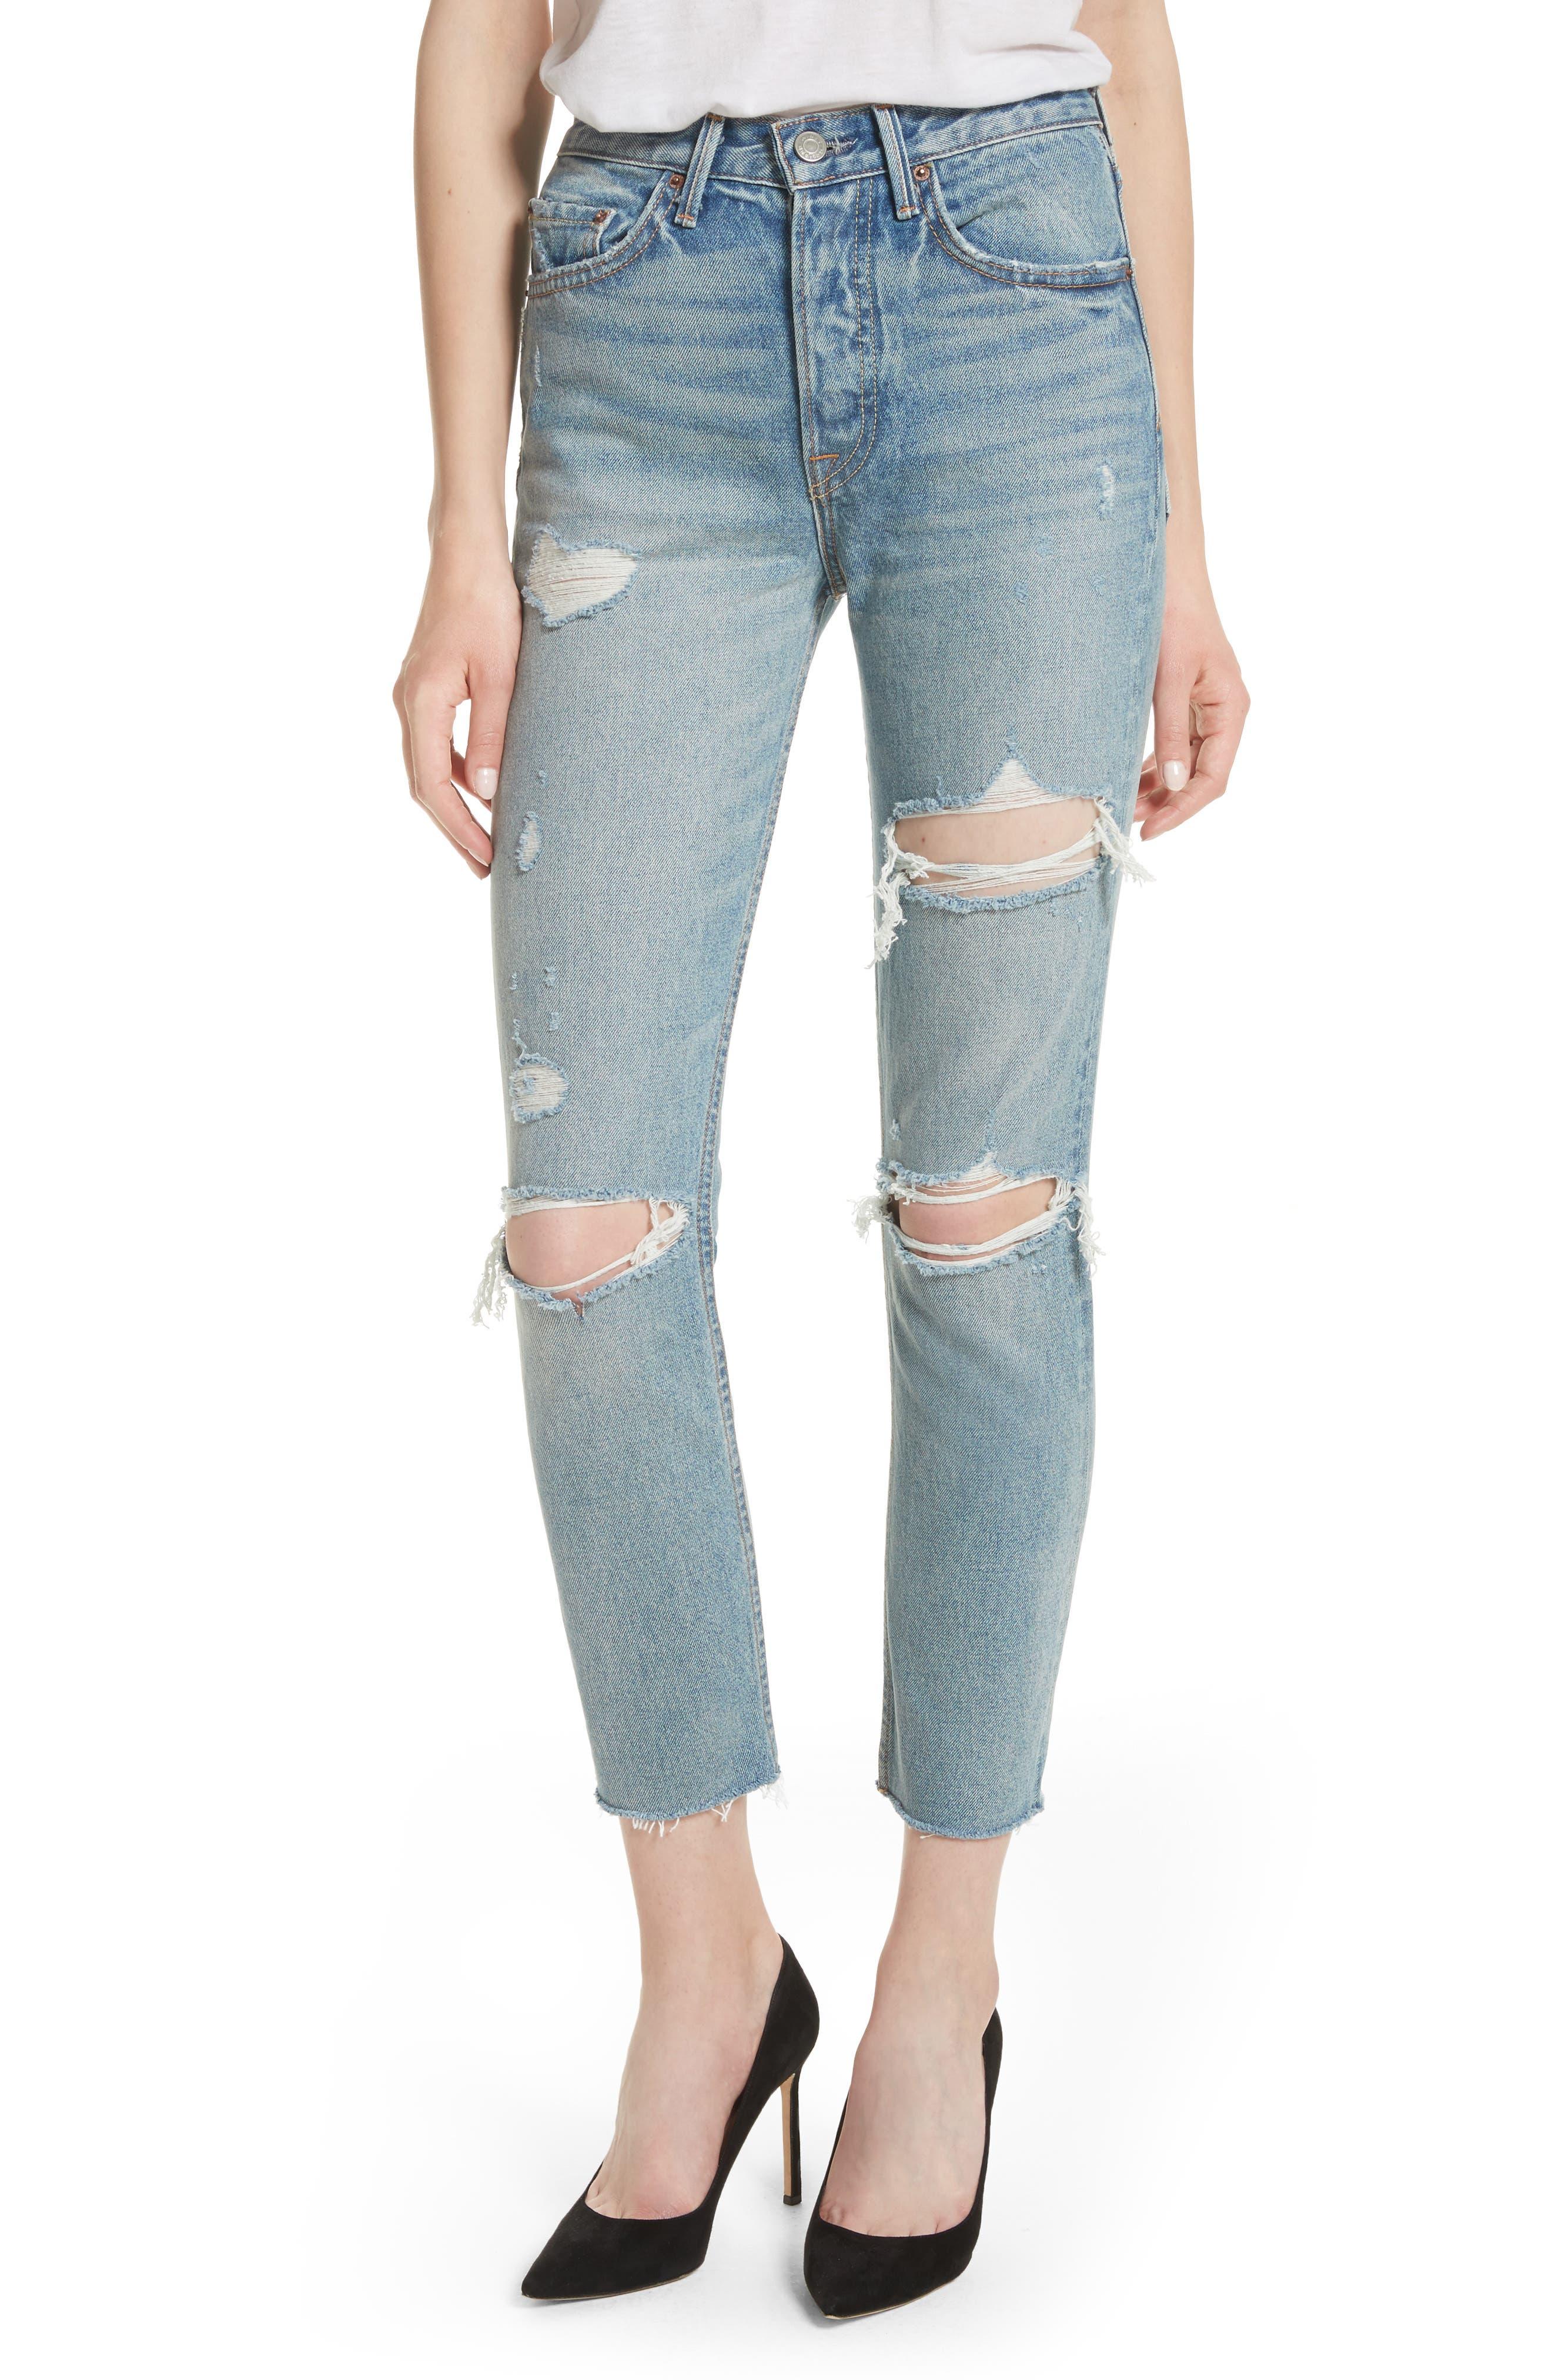 GRLFRND Karolina Rigid High Waist Skinny Jeans (Regular & Petite)  (A Little More Love)